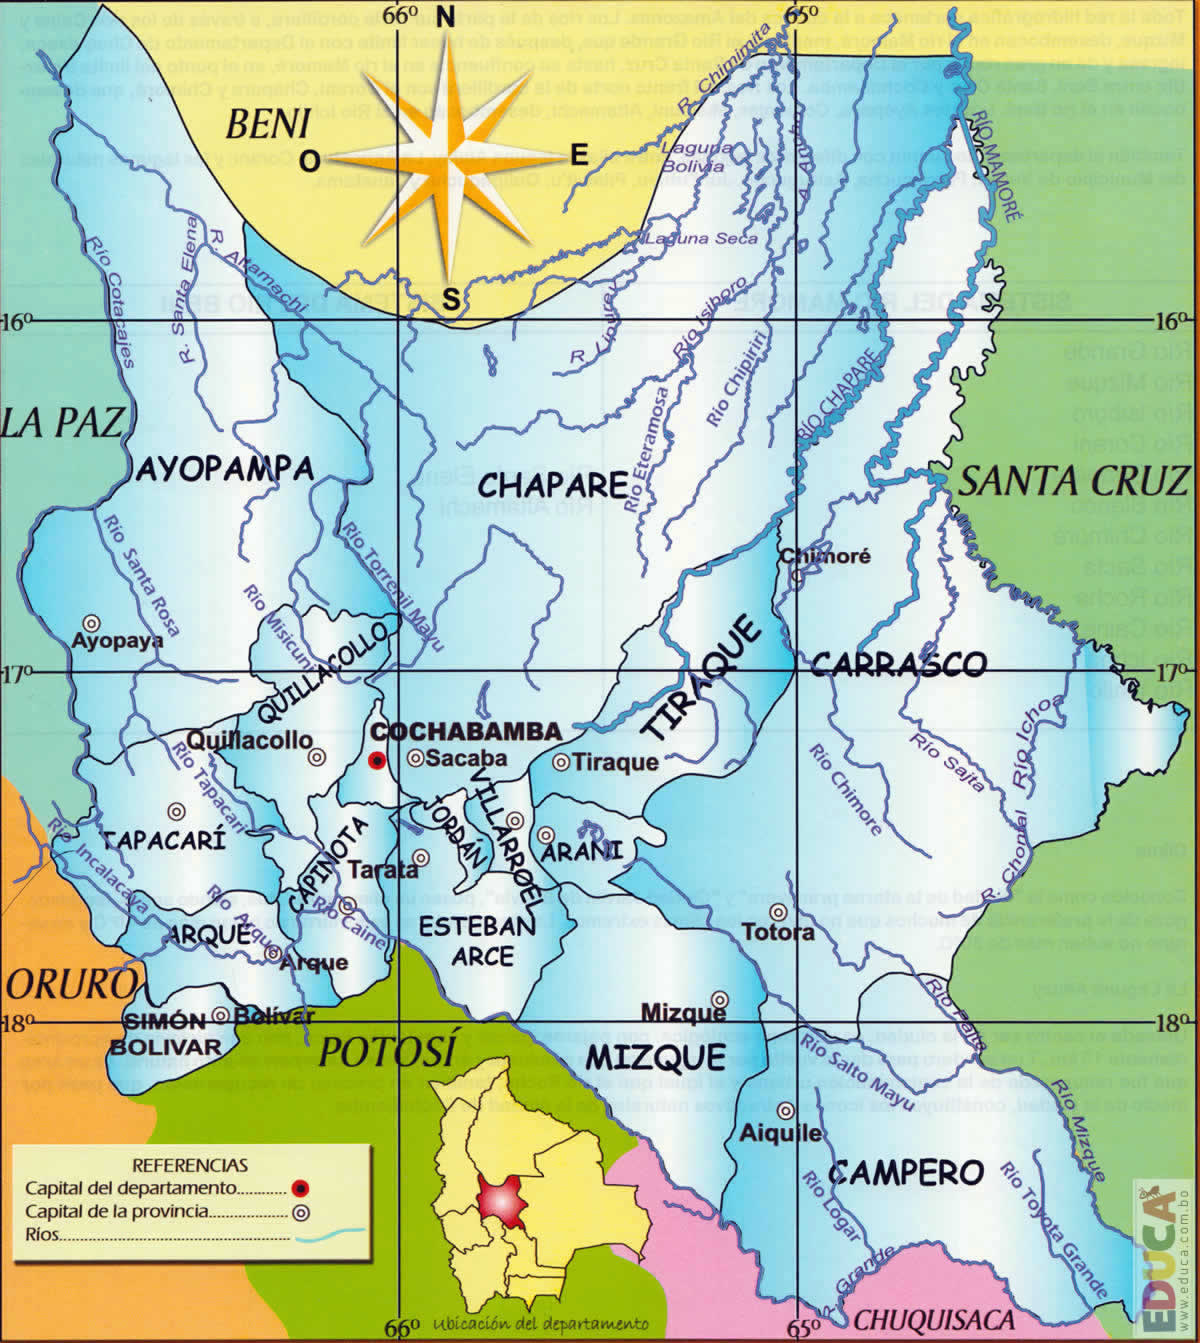 Mapa hidrogrfico de Cochabamba  Departamento de Cochabamba